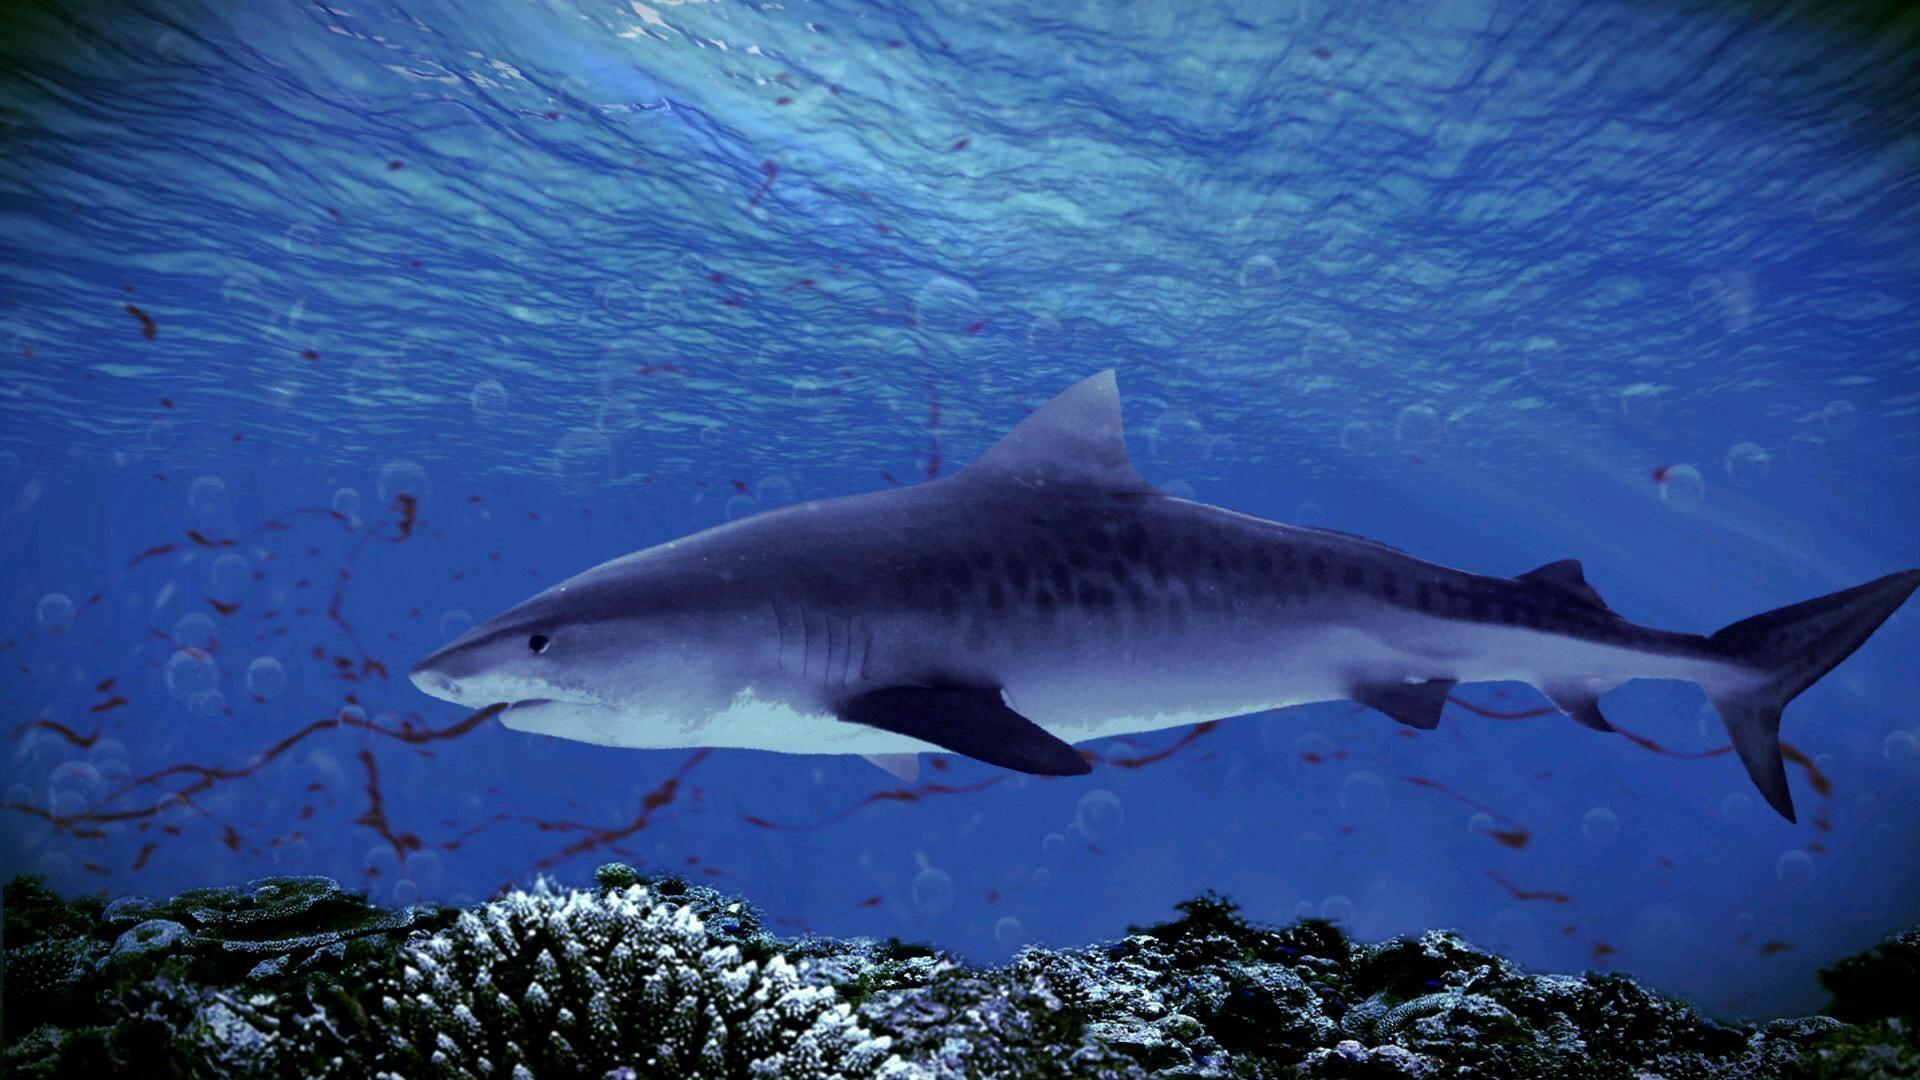 Oceaniczni Drapieżcy / Ocean Predators (2013) Blu-ray 1080p AVC DTS Multi BD25 Lektor PL